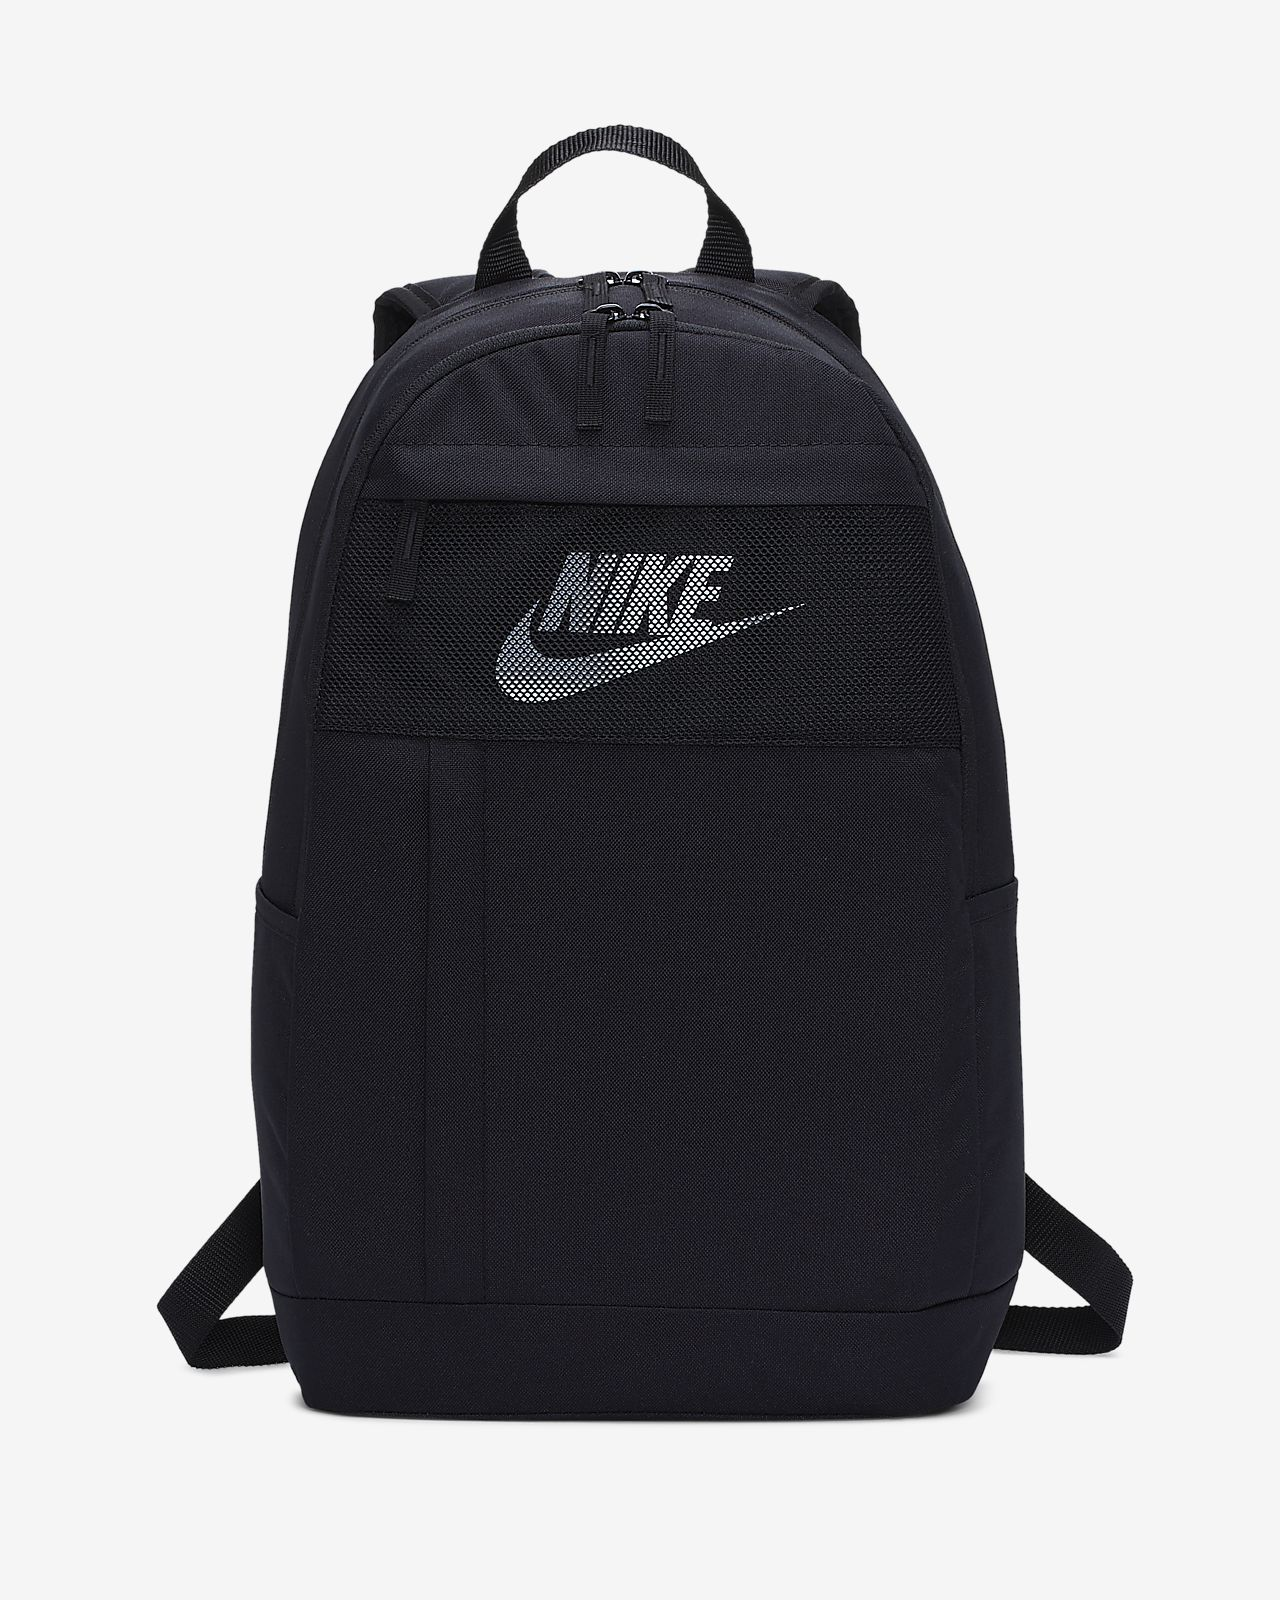 Mochila Nike Elemental LBR